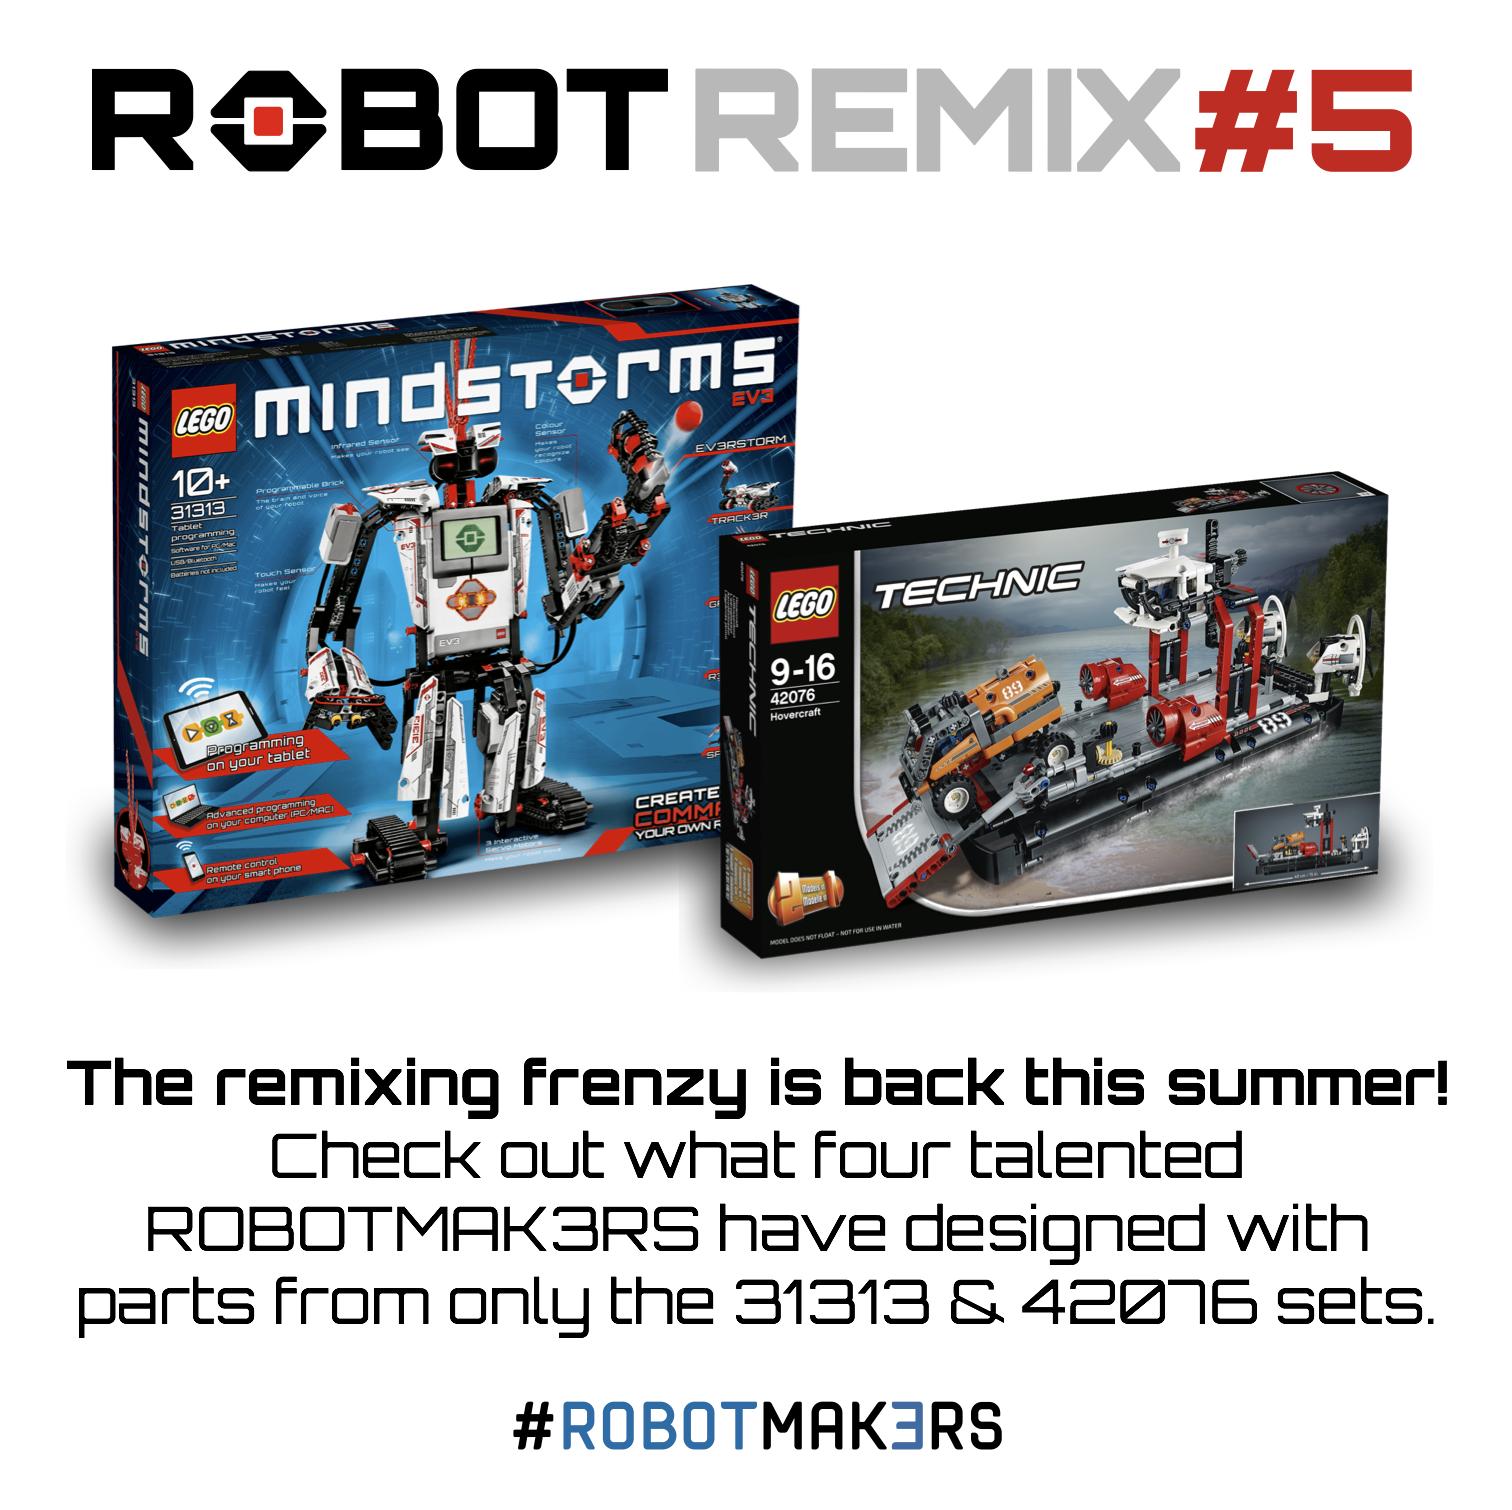 ROBOT REMIX #5   The NXT STEP is EV3 - LEGO® MINDSTORMS® Blog